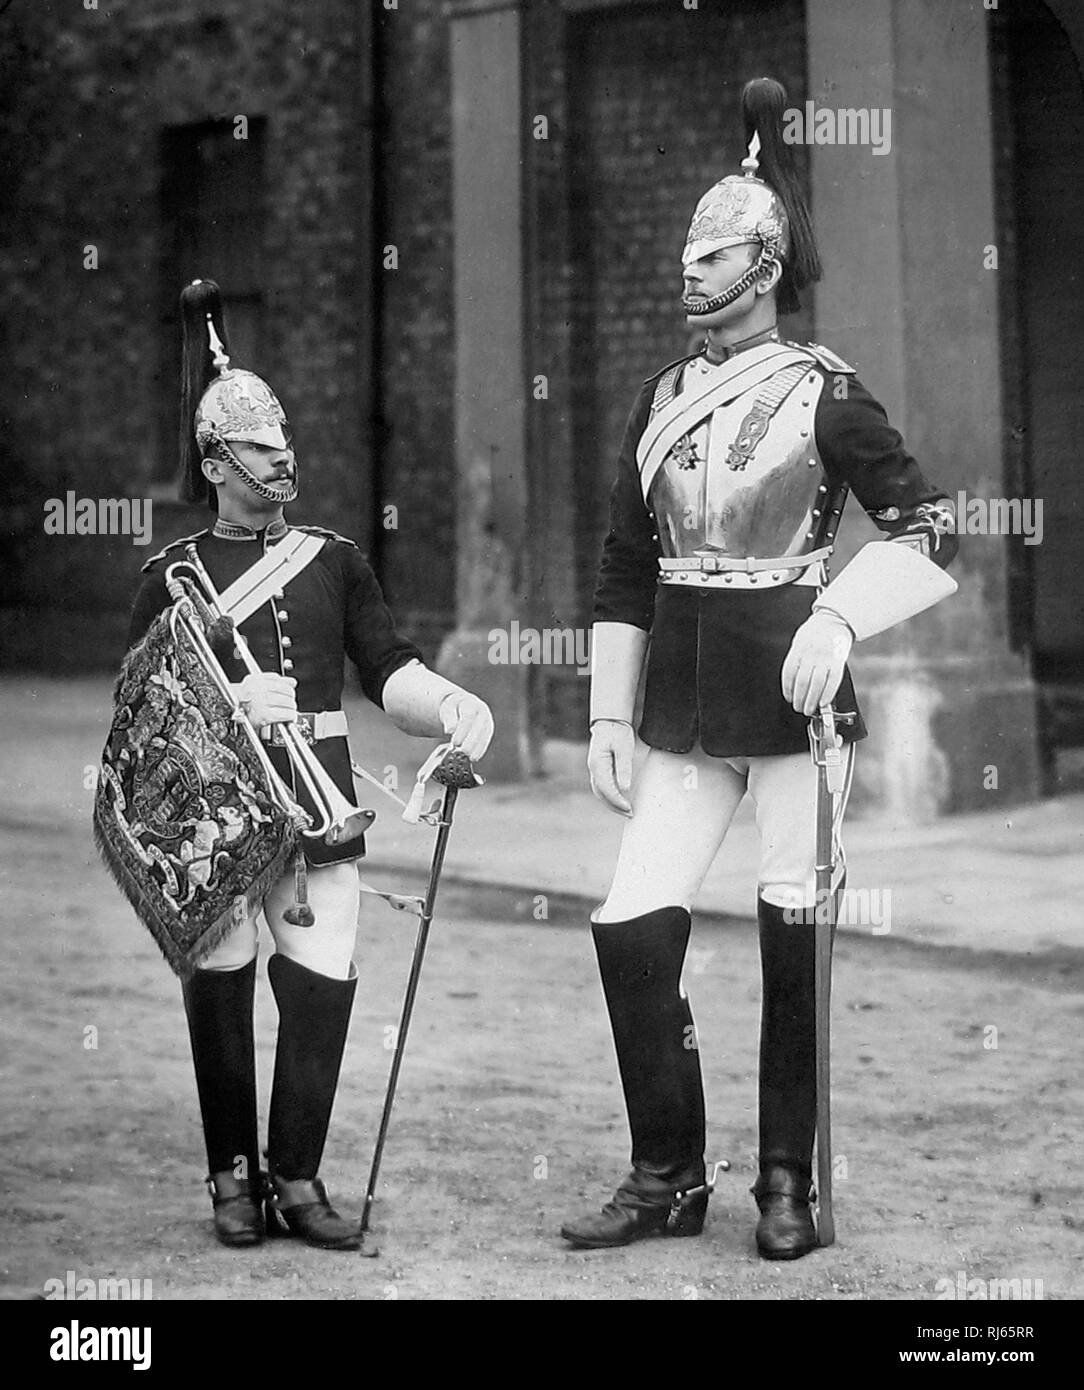 British Army Royal Horse Guards - Stock Image